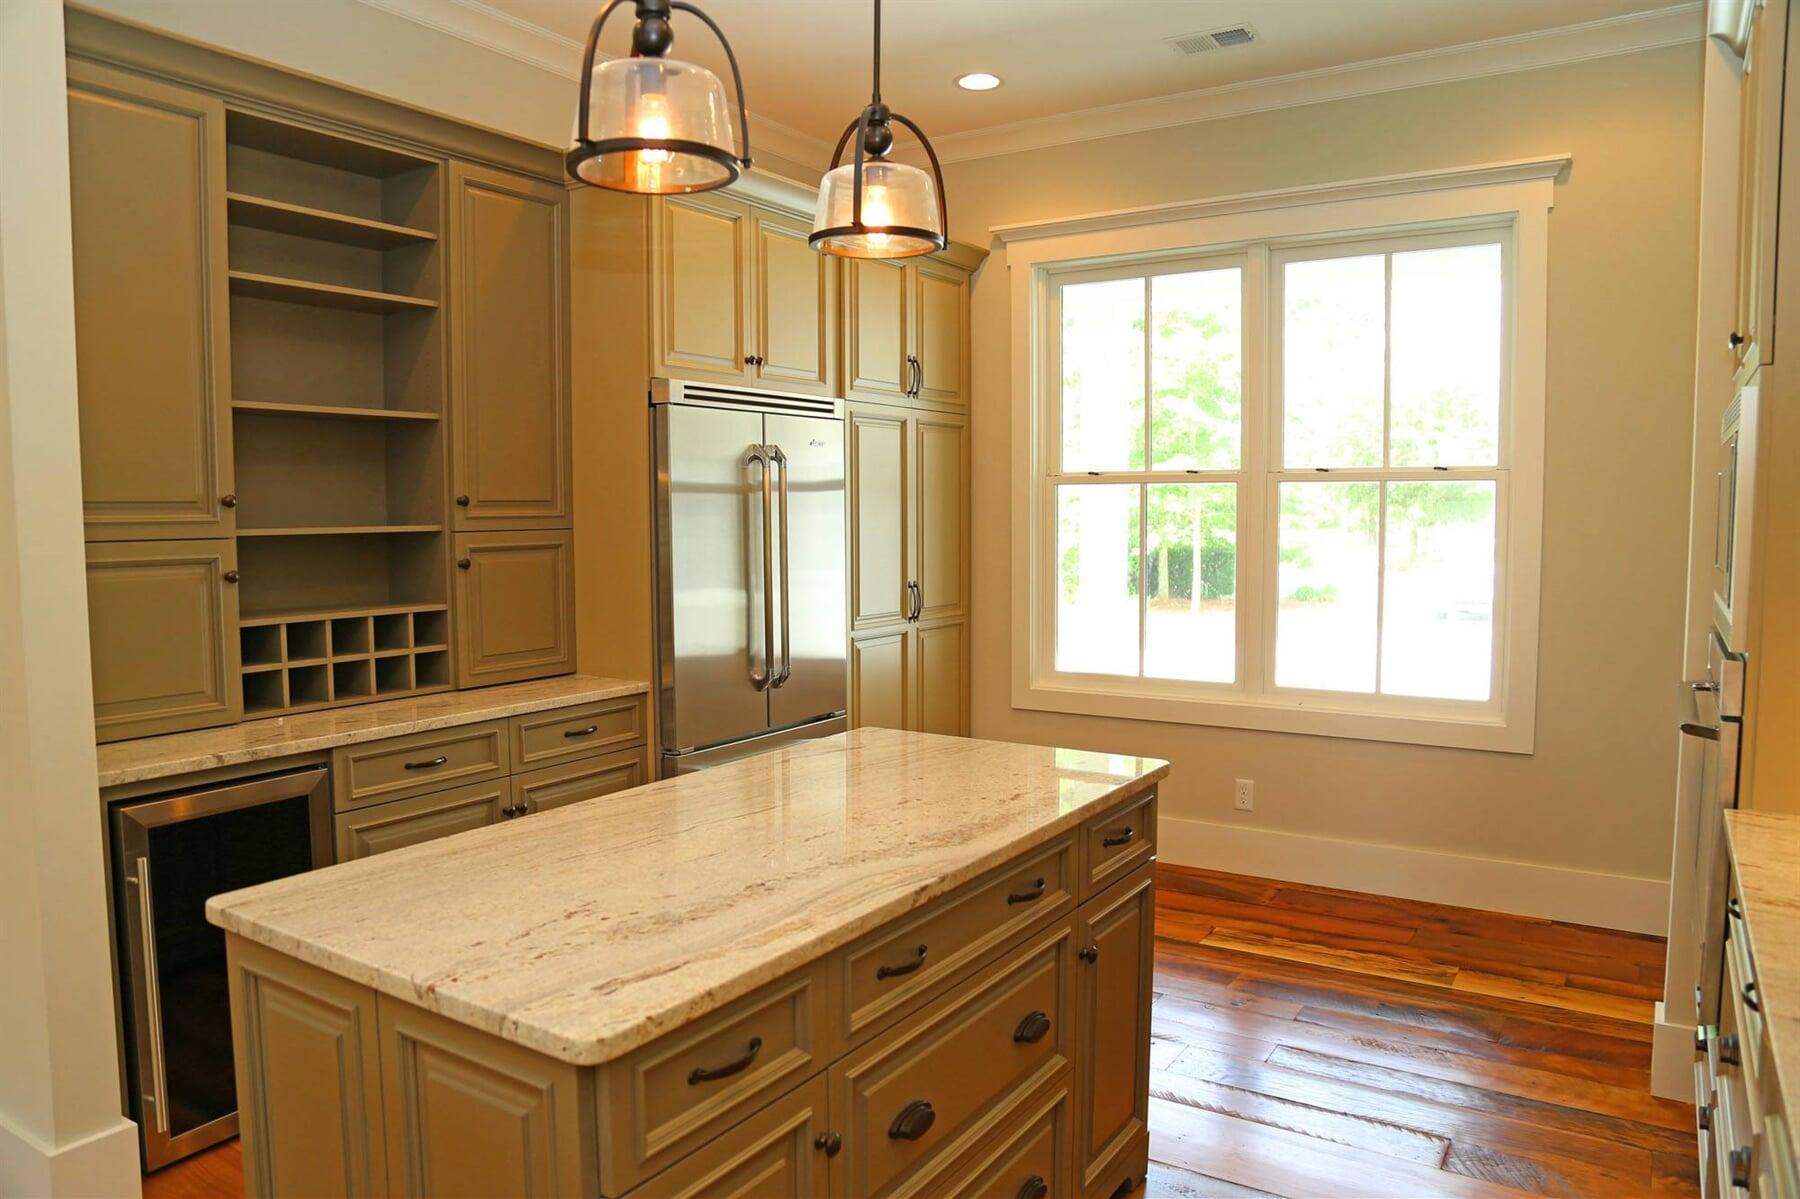 Restored kitchen flooring in Bluffton, SC from Specialty Flooring